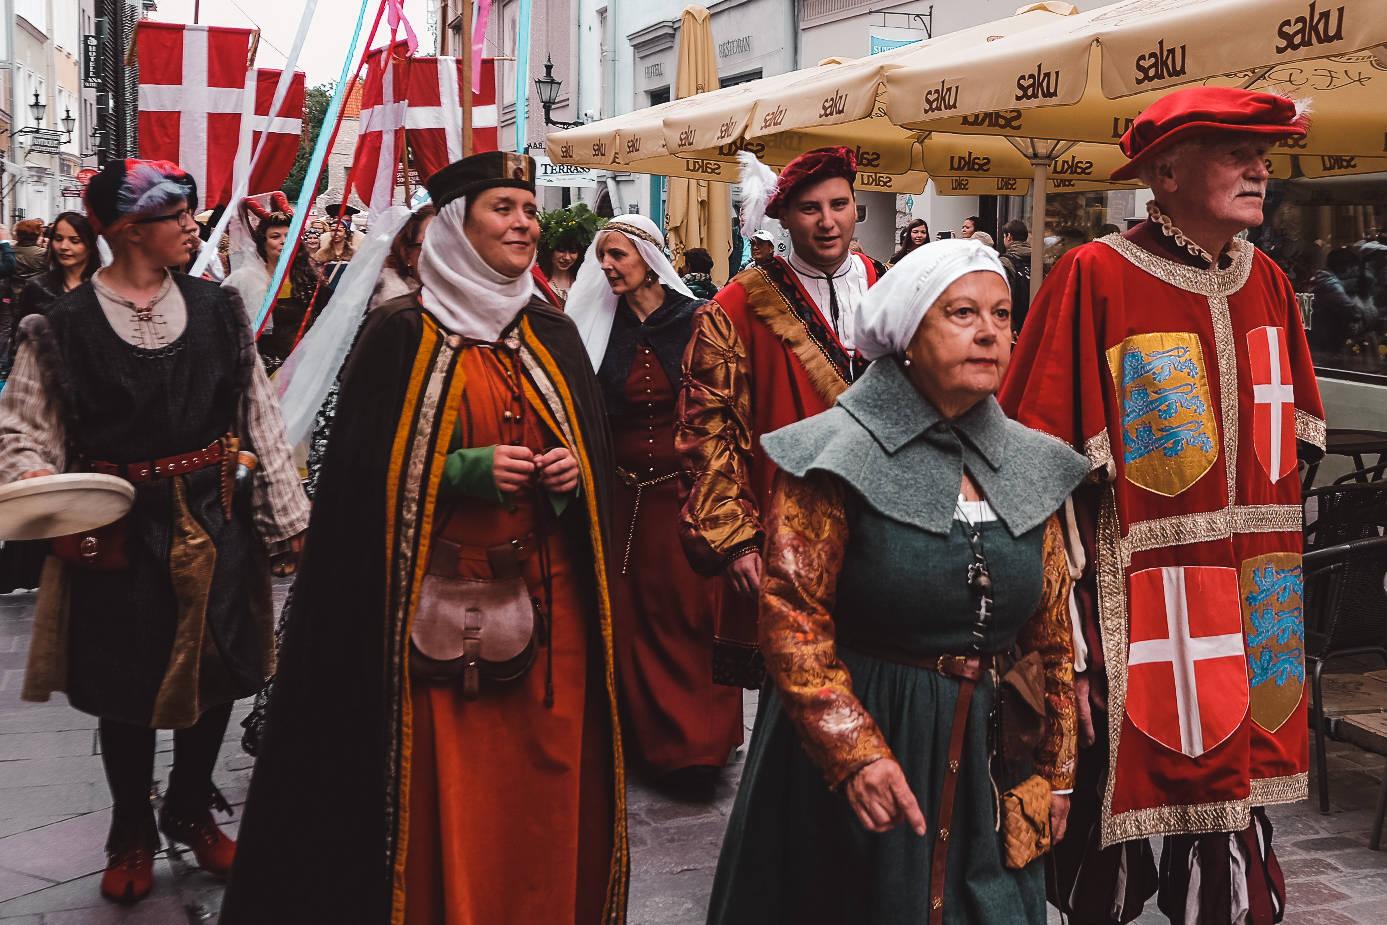 Medieval Days festival in Tallinn, Estonia